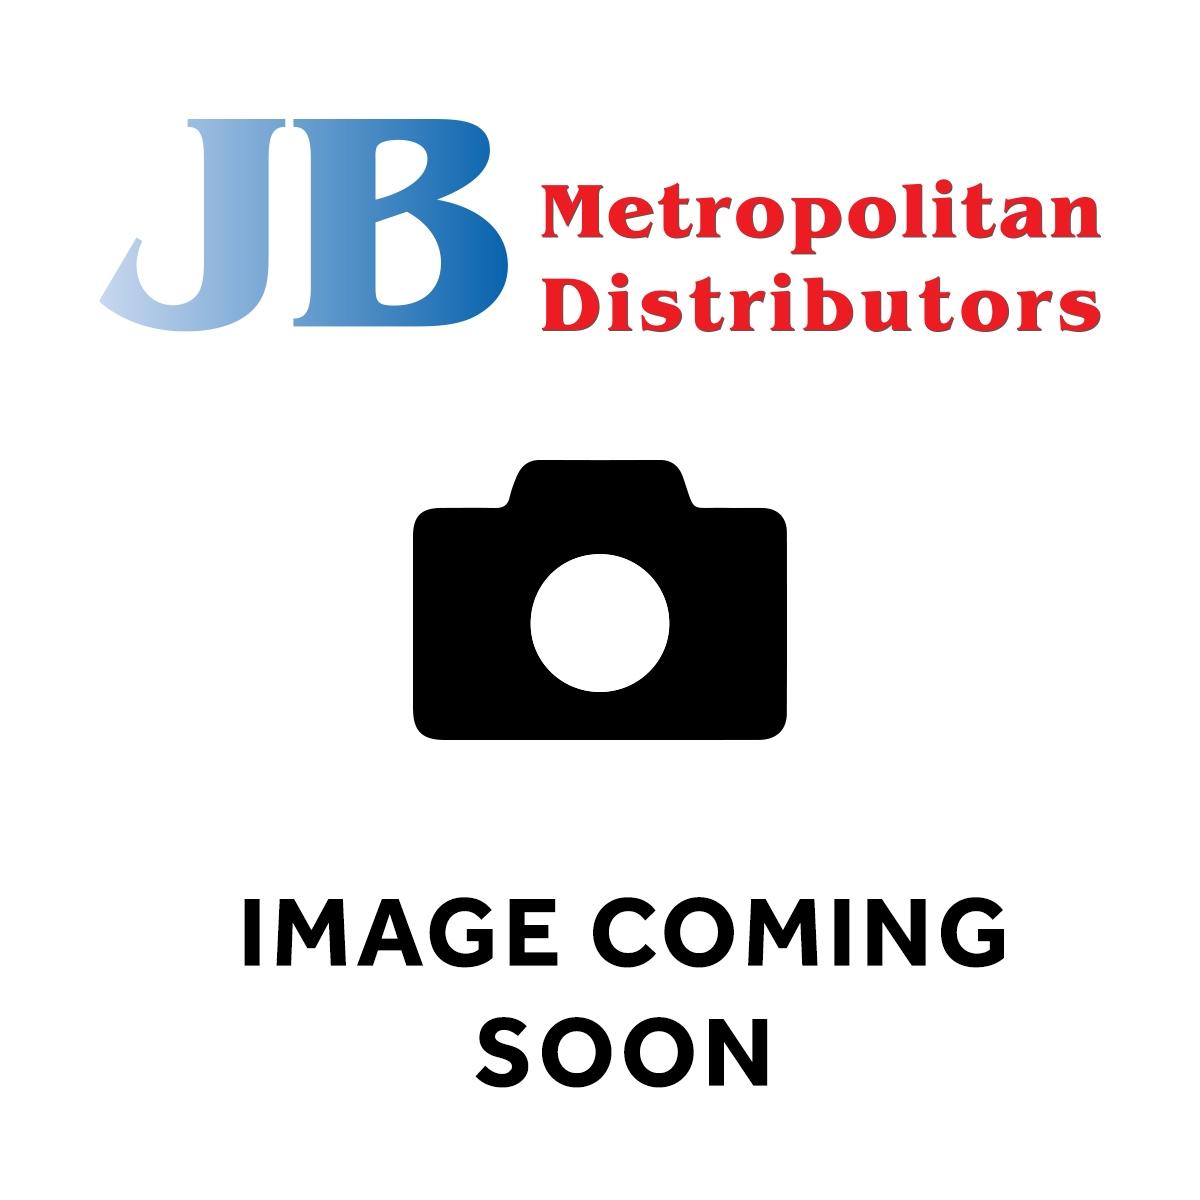 60G BYRON BAY TRIPLE CHOCOLATE FUDGE COOKIE